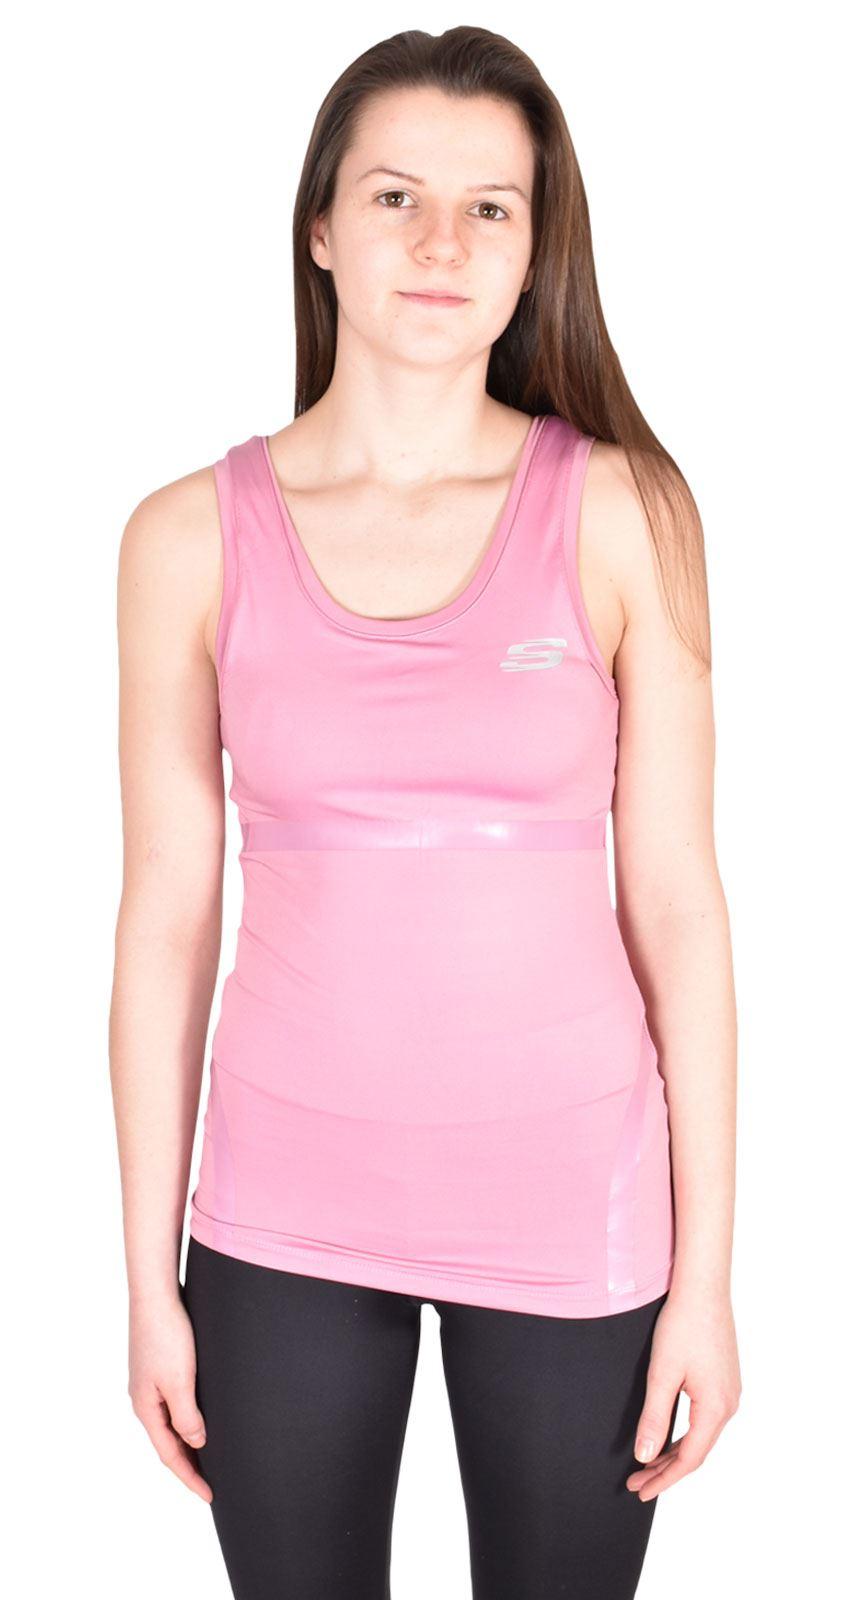 Ladies Skechers Stretctable Top Cotton Women Sports Dance Fitness Vest